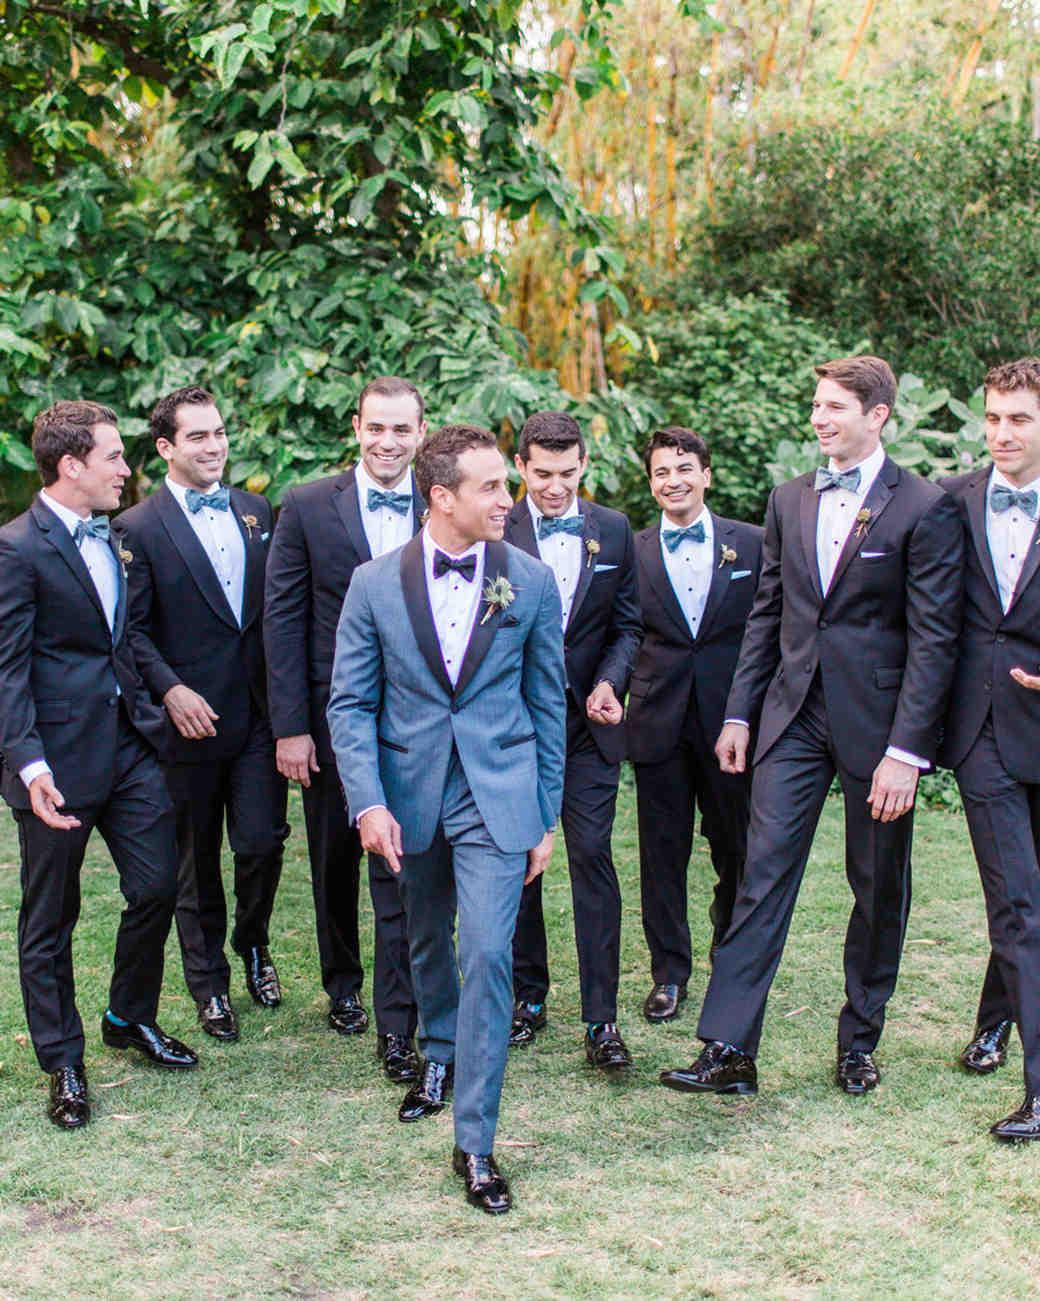 groom poses with groomsmen smiling